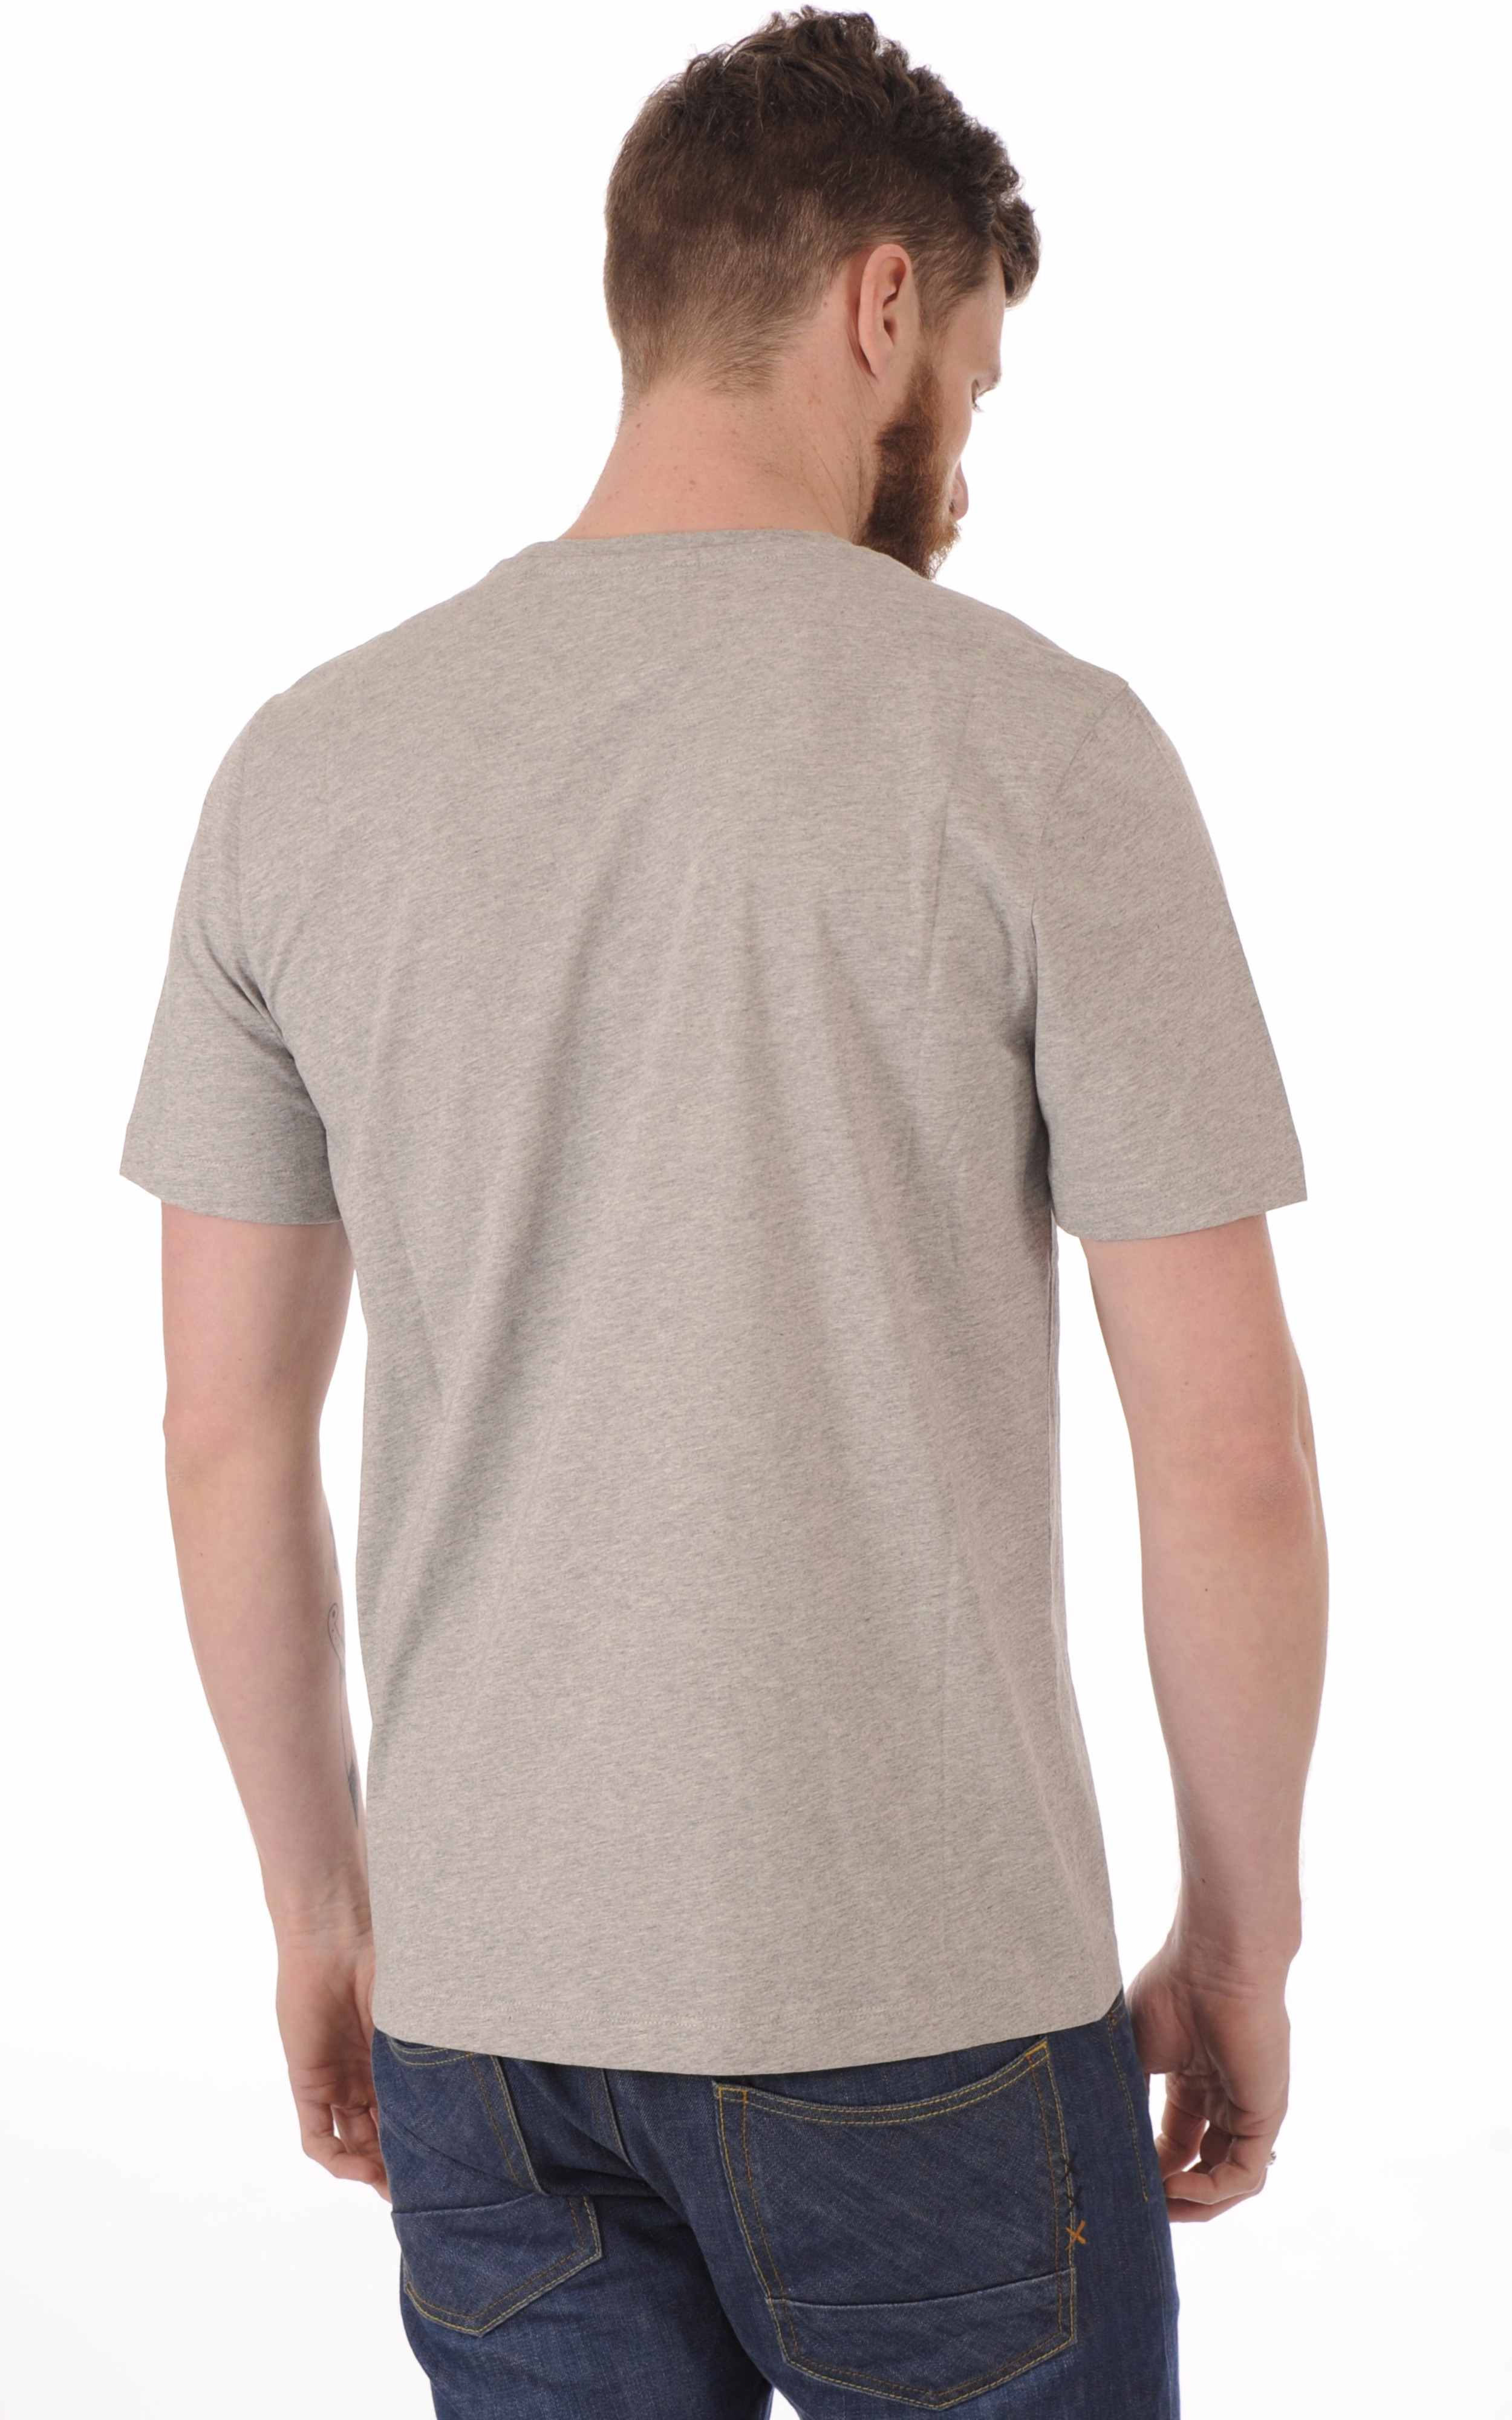 T-shirt 1923 Gris Aeronautica Militare